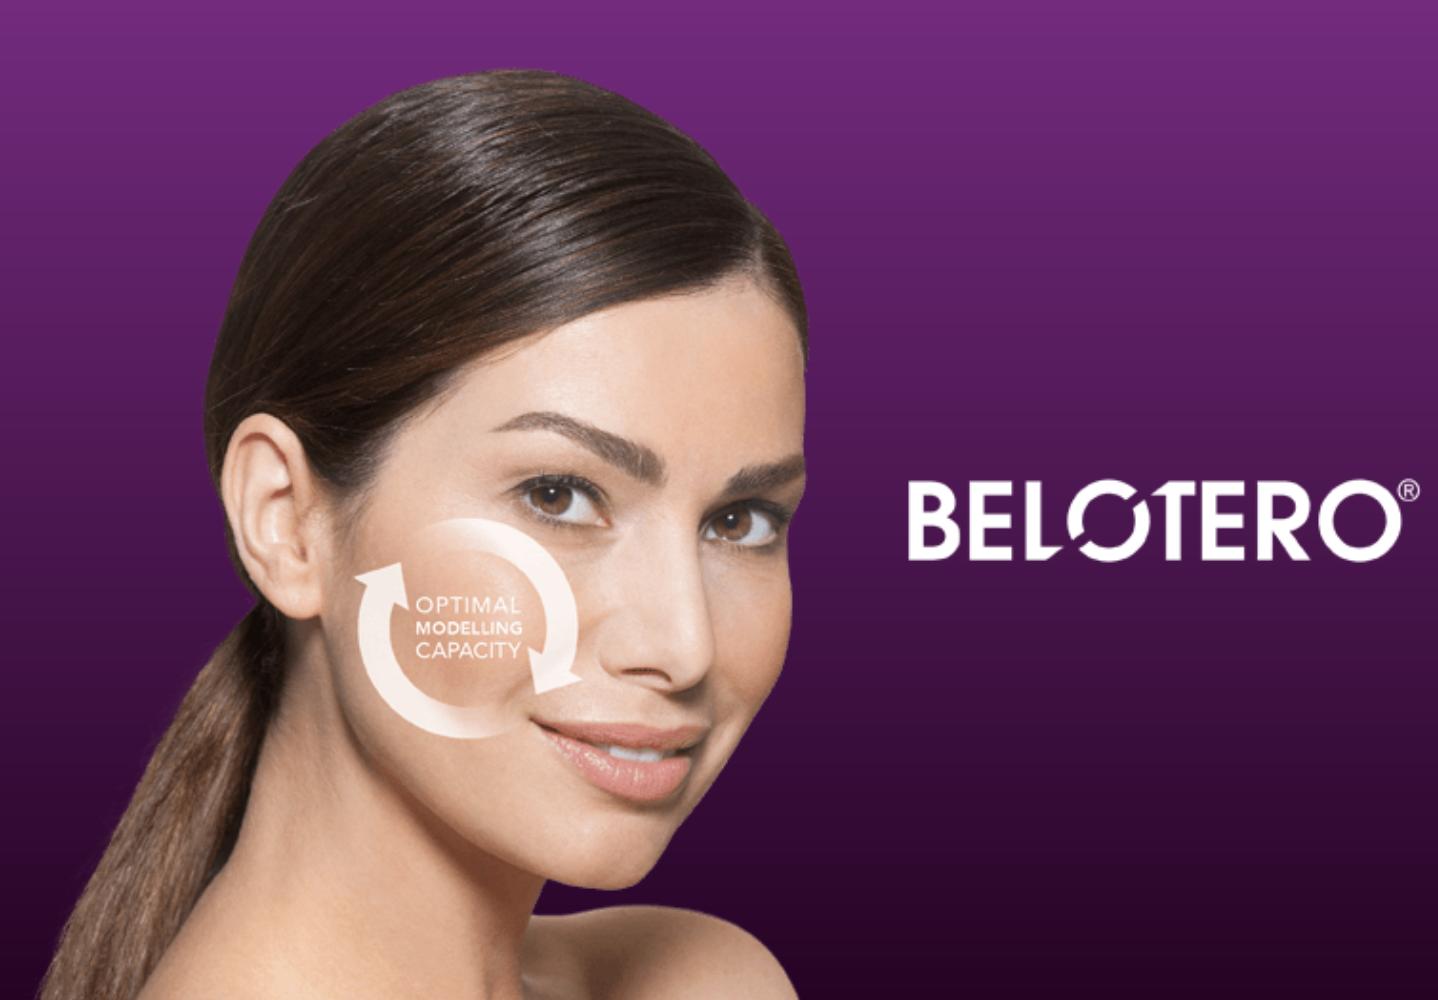 Belotero treatments Taunton